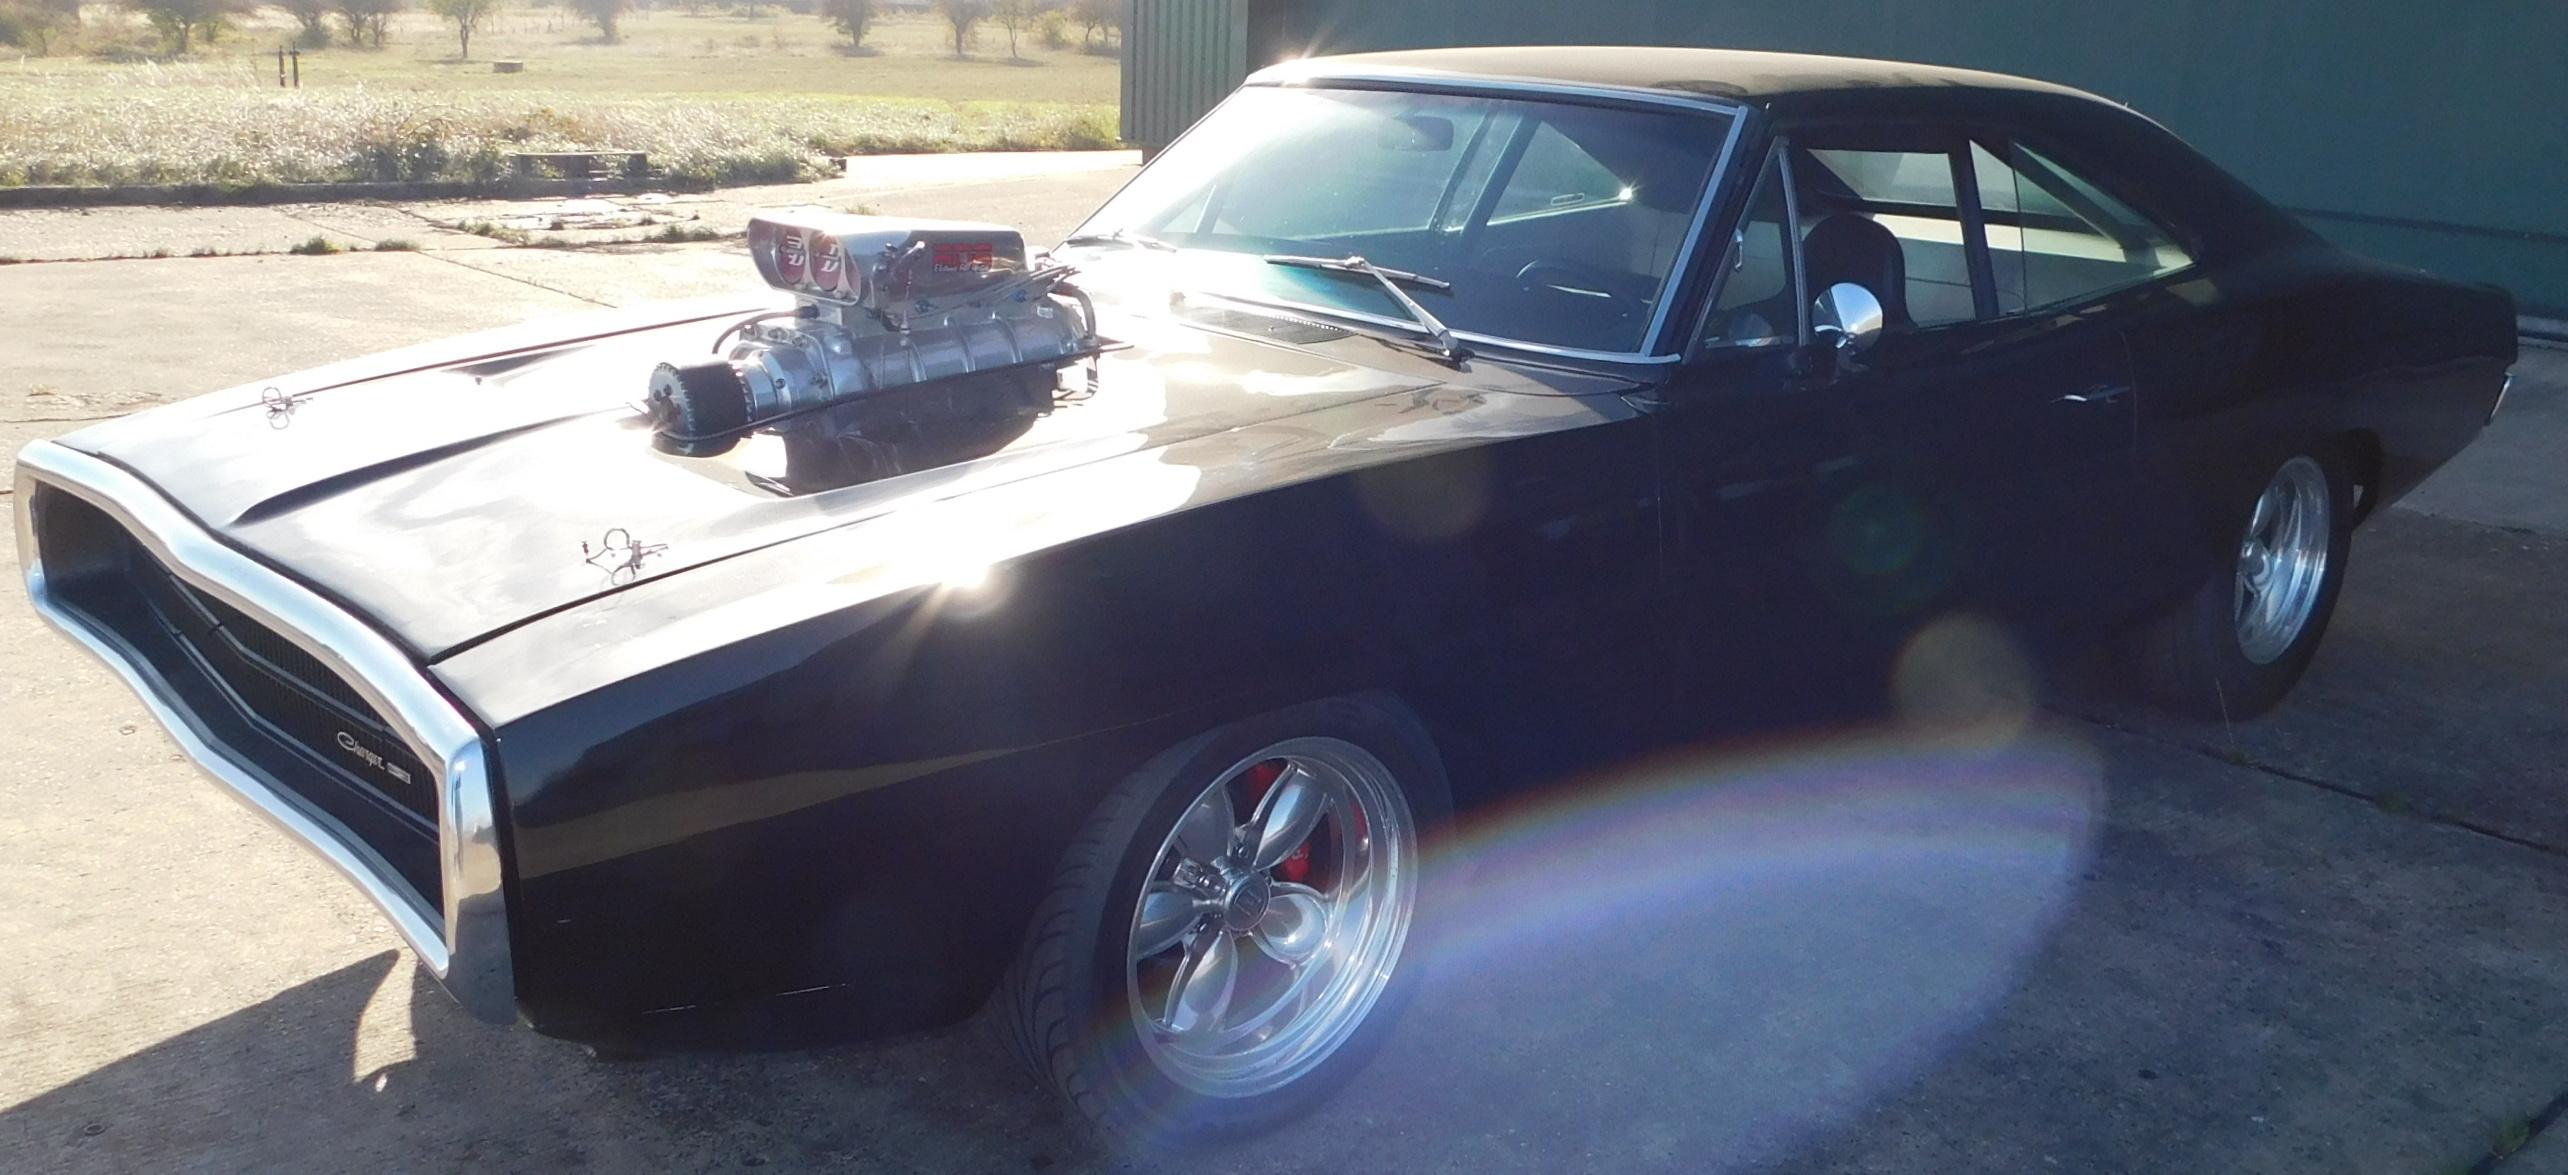 Lot 5 - Dennis McCarthy Special Build 1970 Dodge Charger R/T LHD 2 Door Coupe, General Motors V8 6.2 Litre